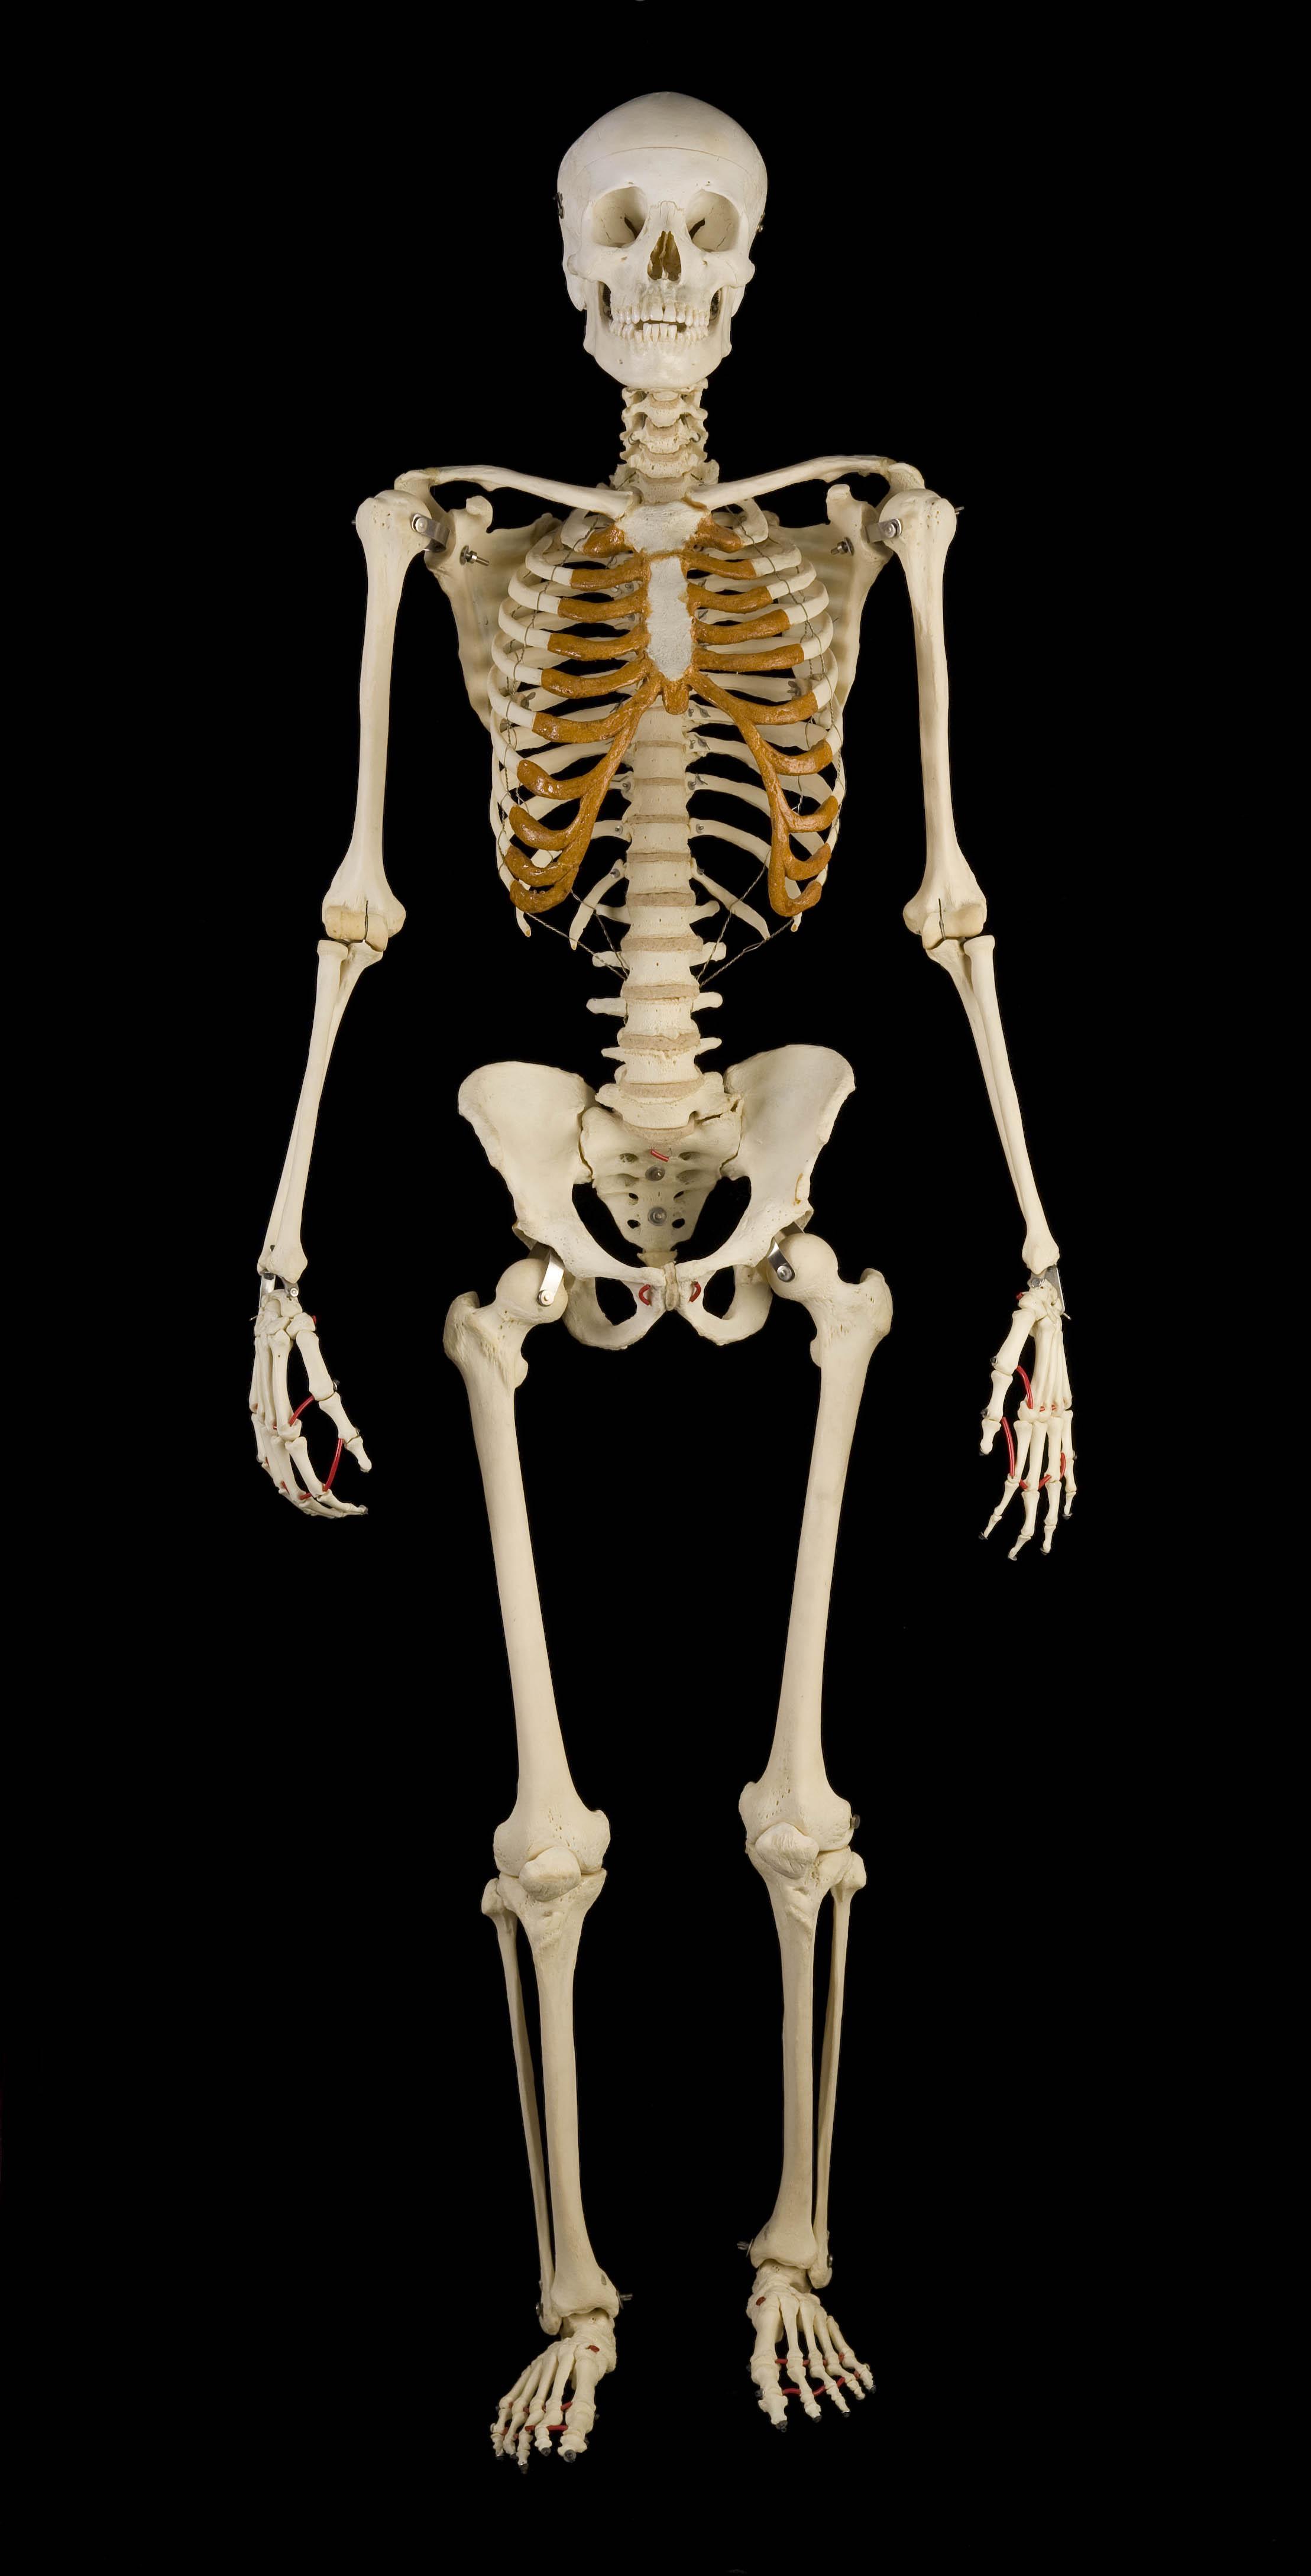 2217x4356 > Skeleton Wallpapers